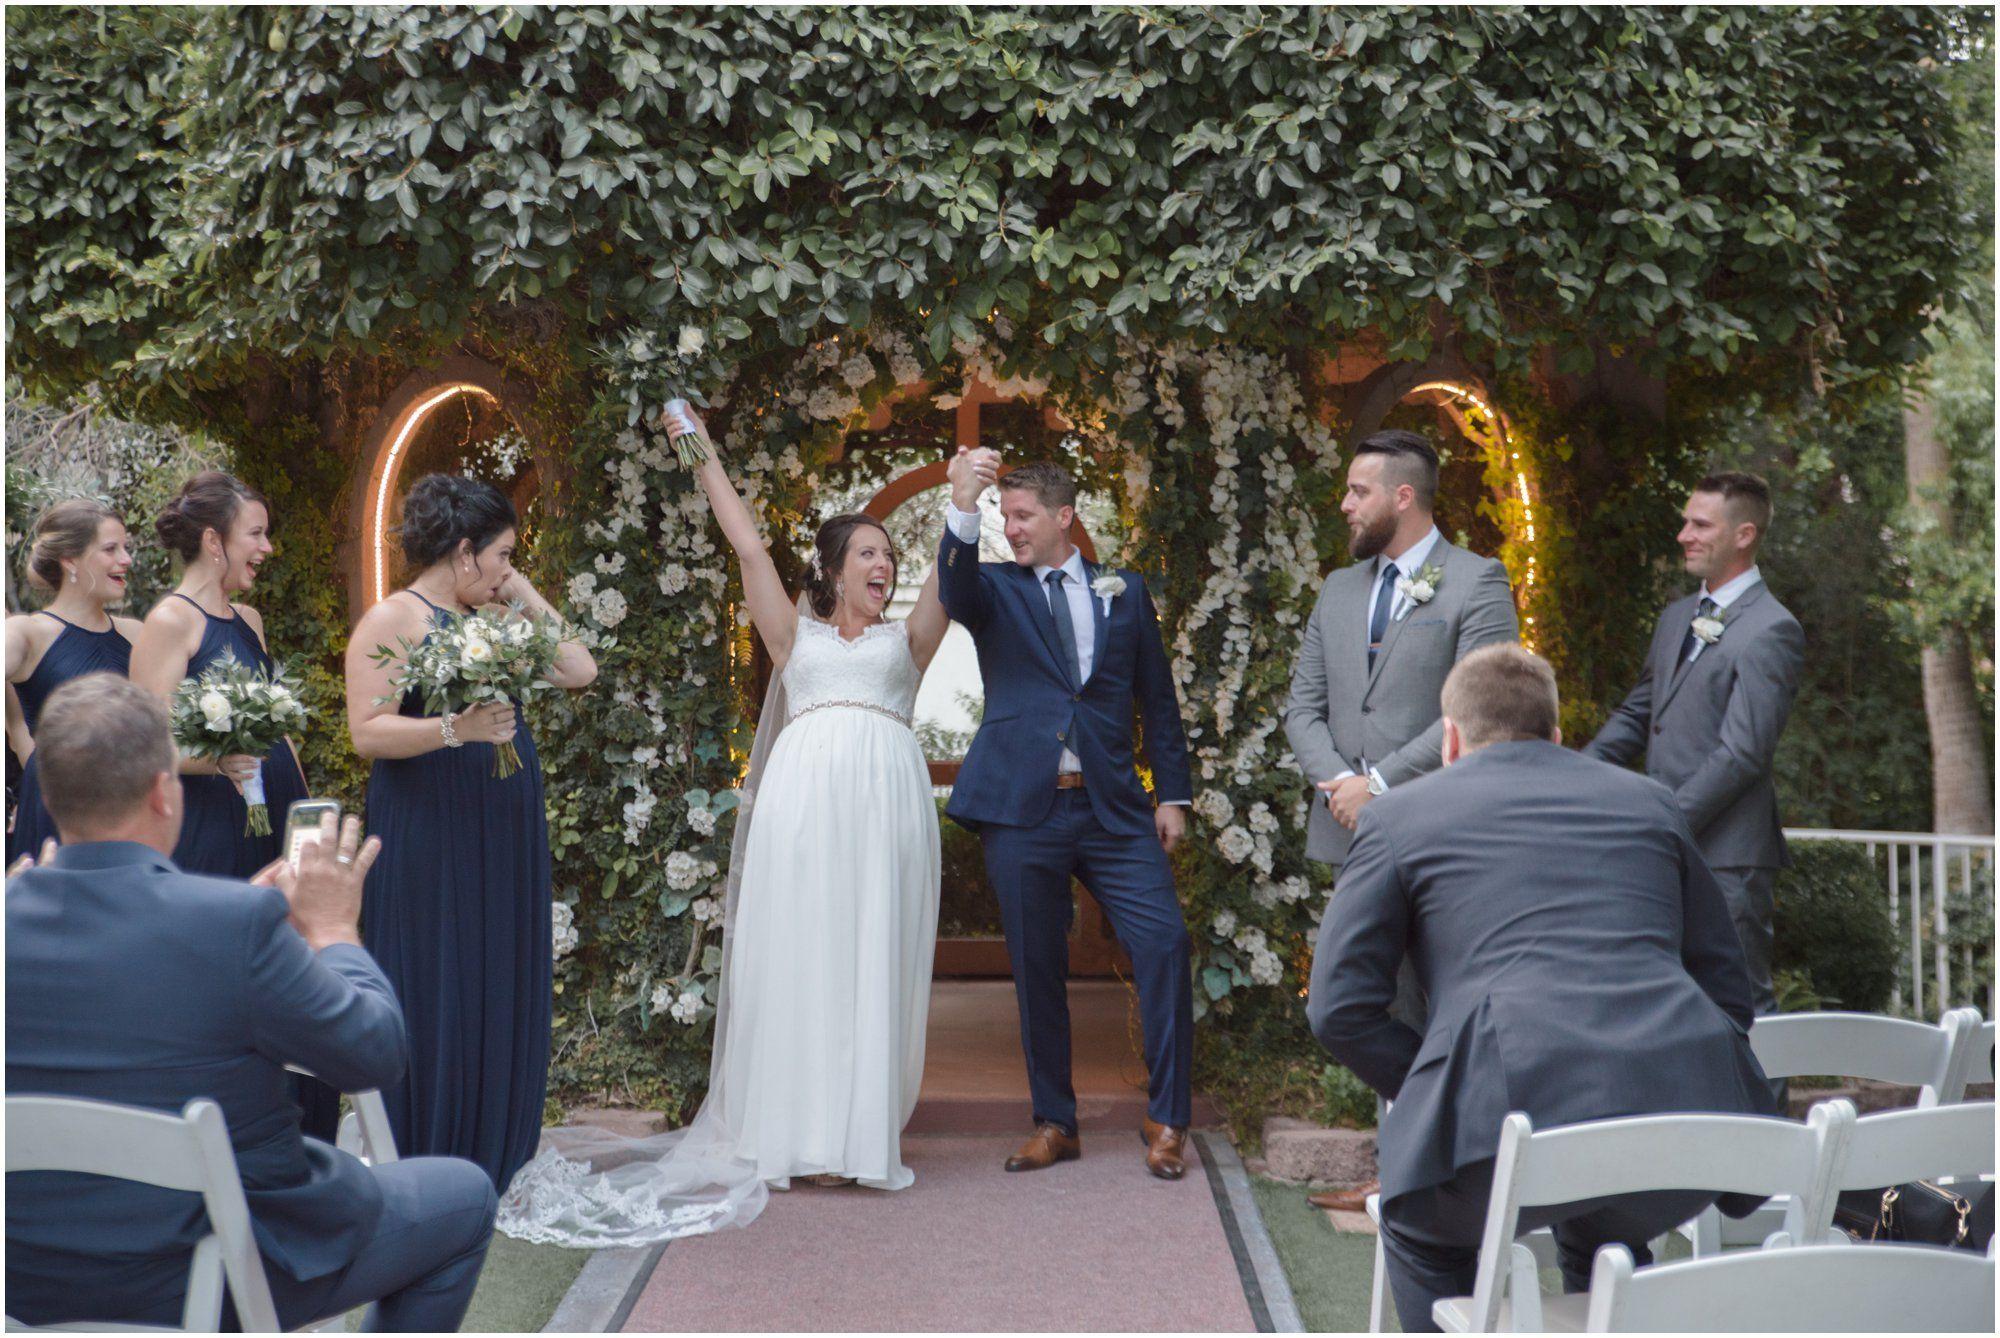 Ariane Rory Wedding At The Flamingo Hotel Casino Conservative Wedding Dress Las Vegas Wedding Venue Outdoor Las Vegas Wedding